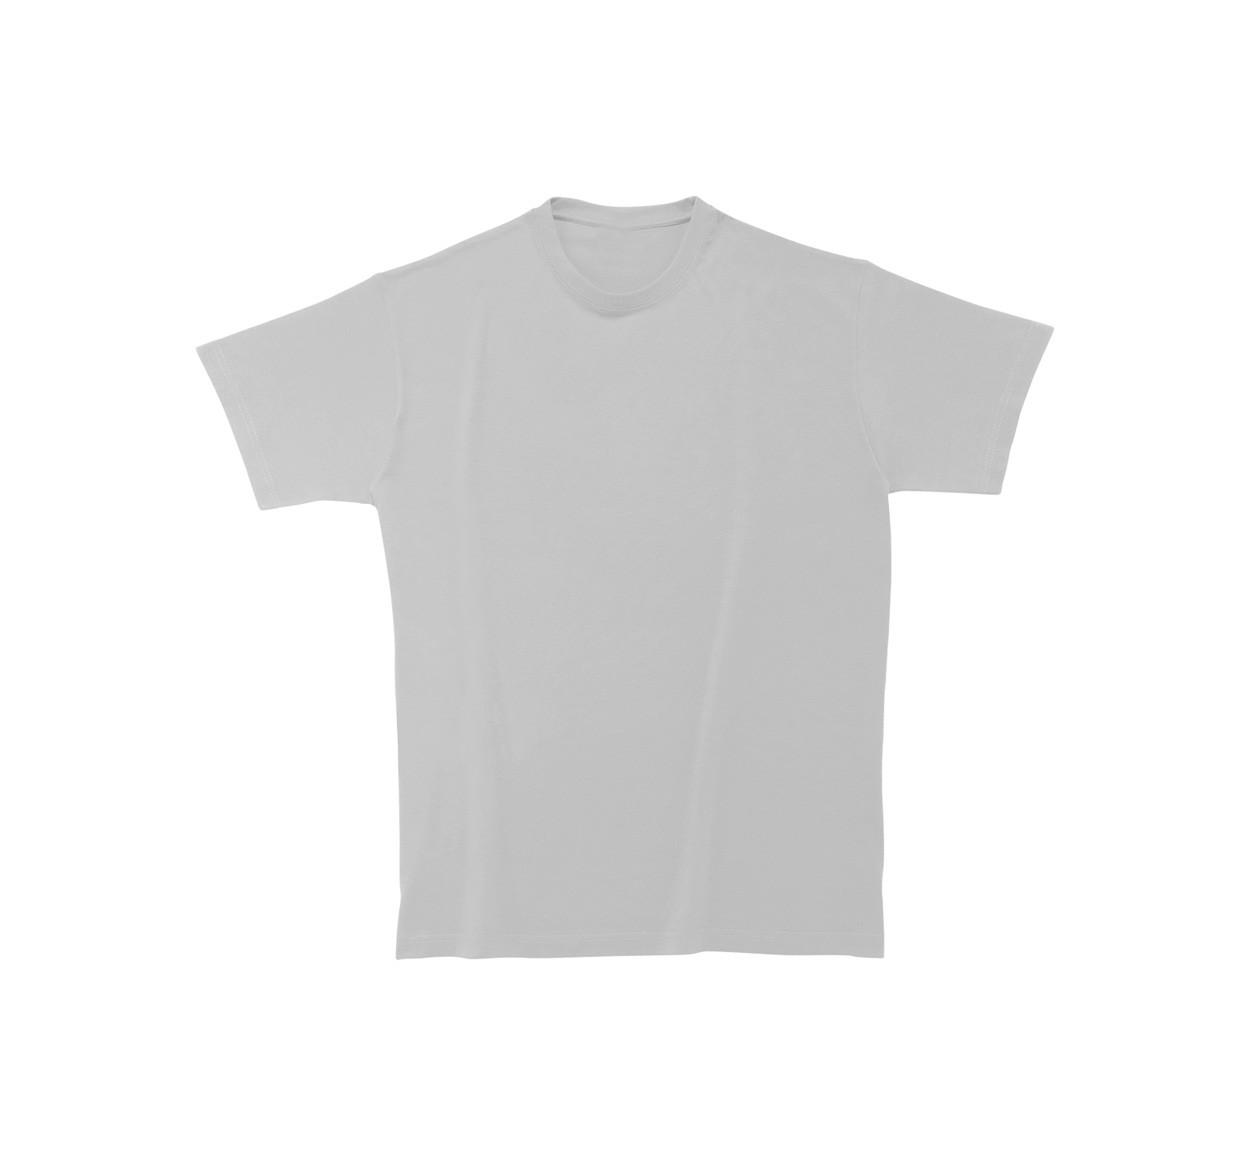 Tričko Pro Děti HC Junior - Bílá / M